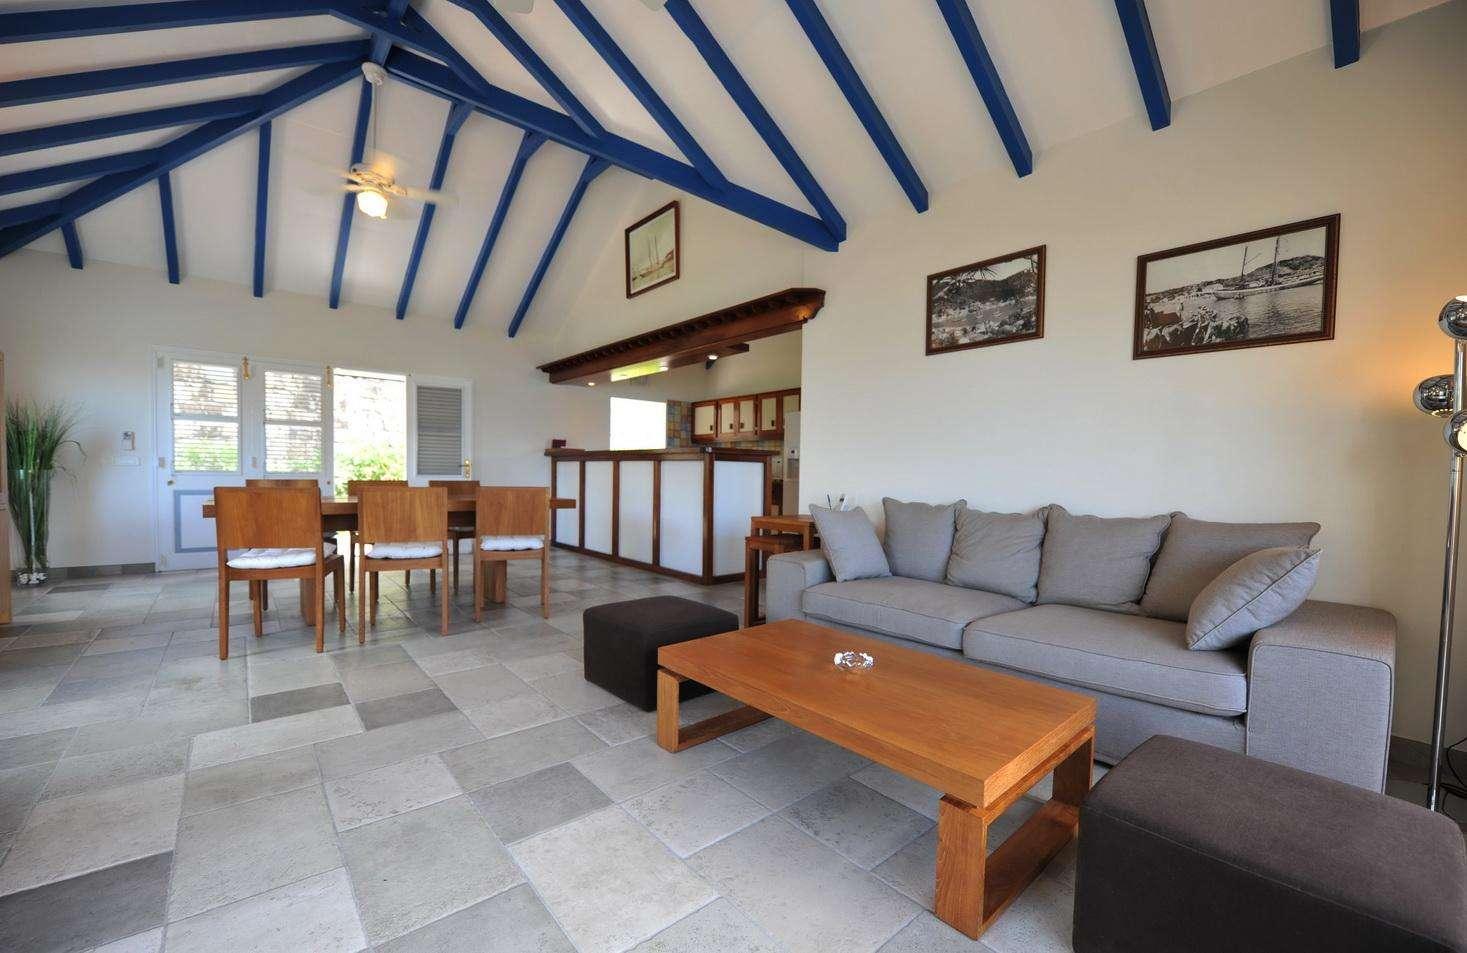 Luxury villa rentals caribbean - St barthelemy - Gustavia - Ostra Strandgatan - Image 1/12